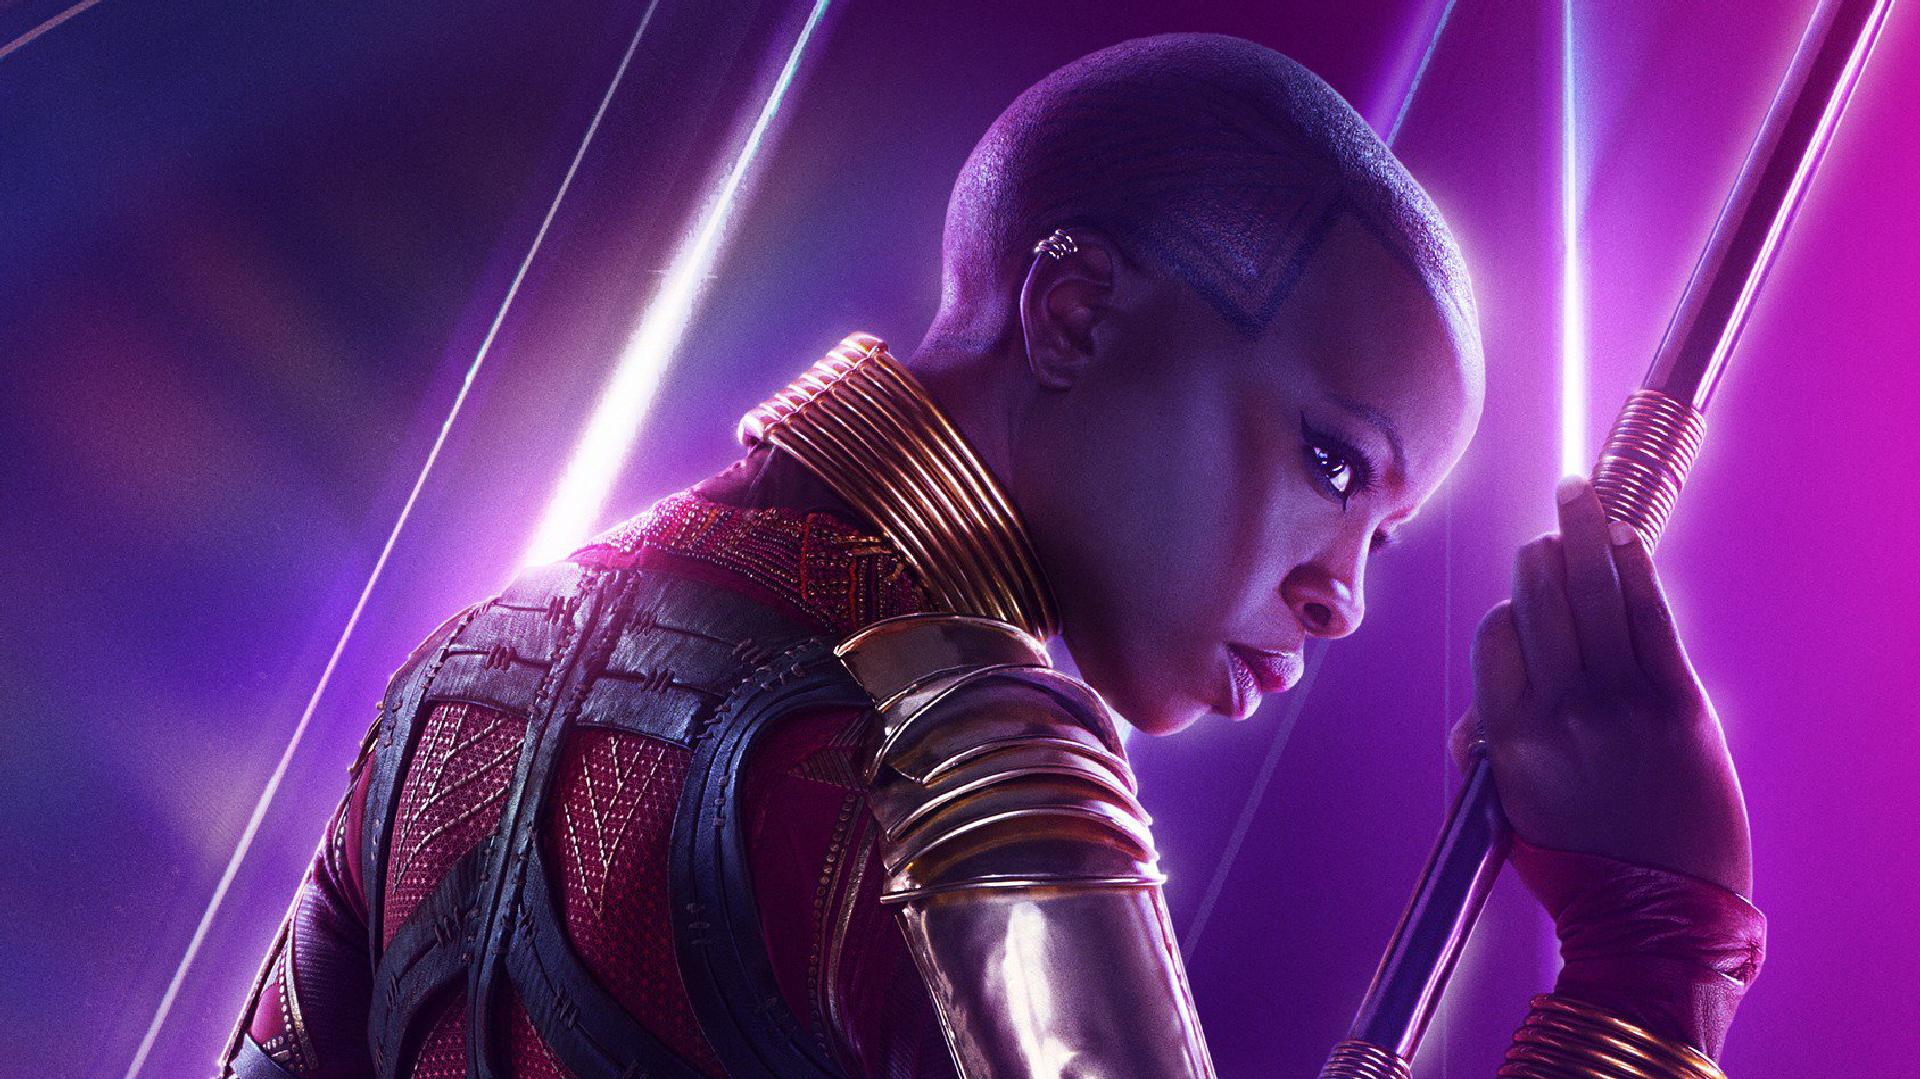 Shuri In Avengers Infinity War New Poster Hd Movies 4k: Okoye In Avengers Infinity War New Poster, HD Movies, 4k